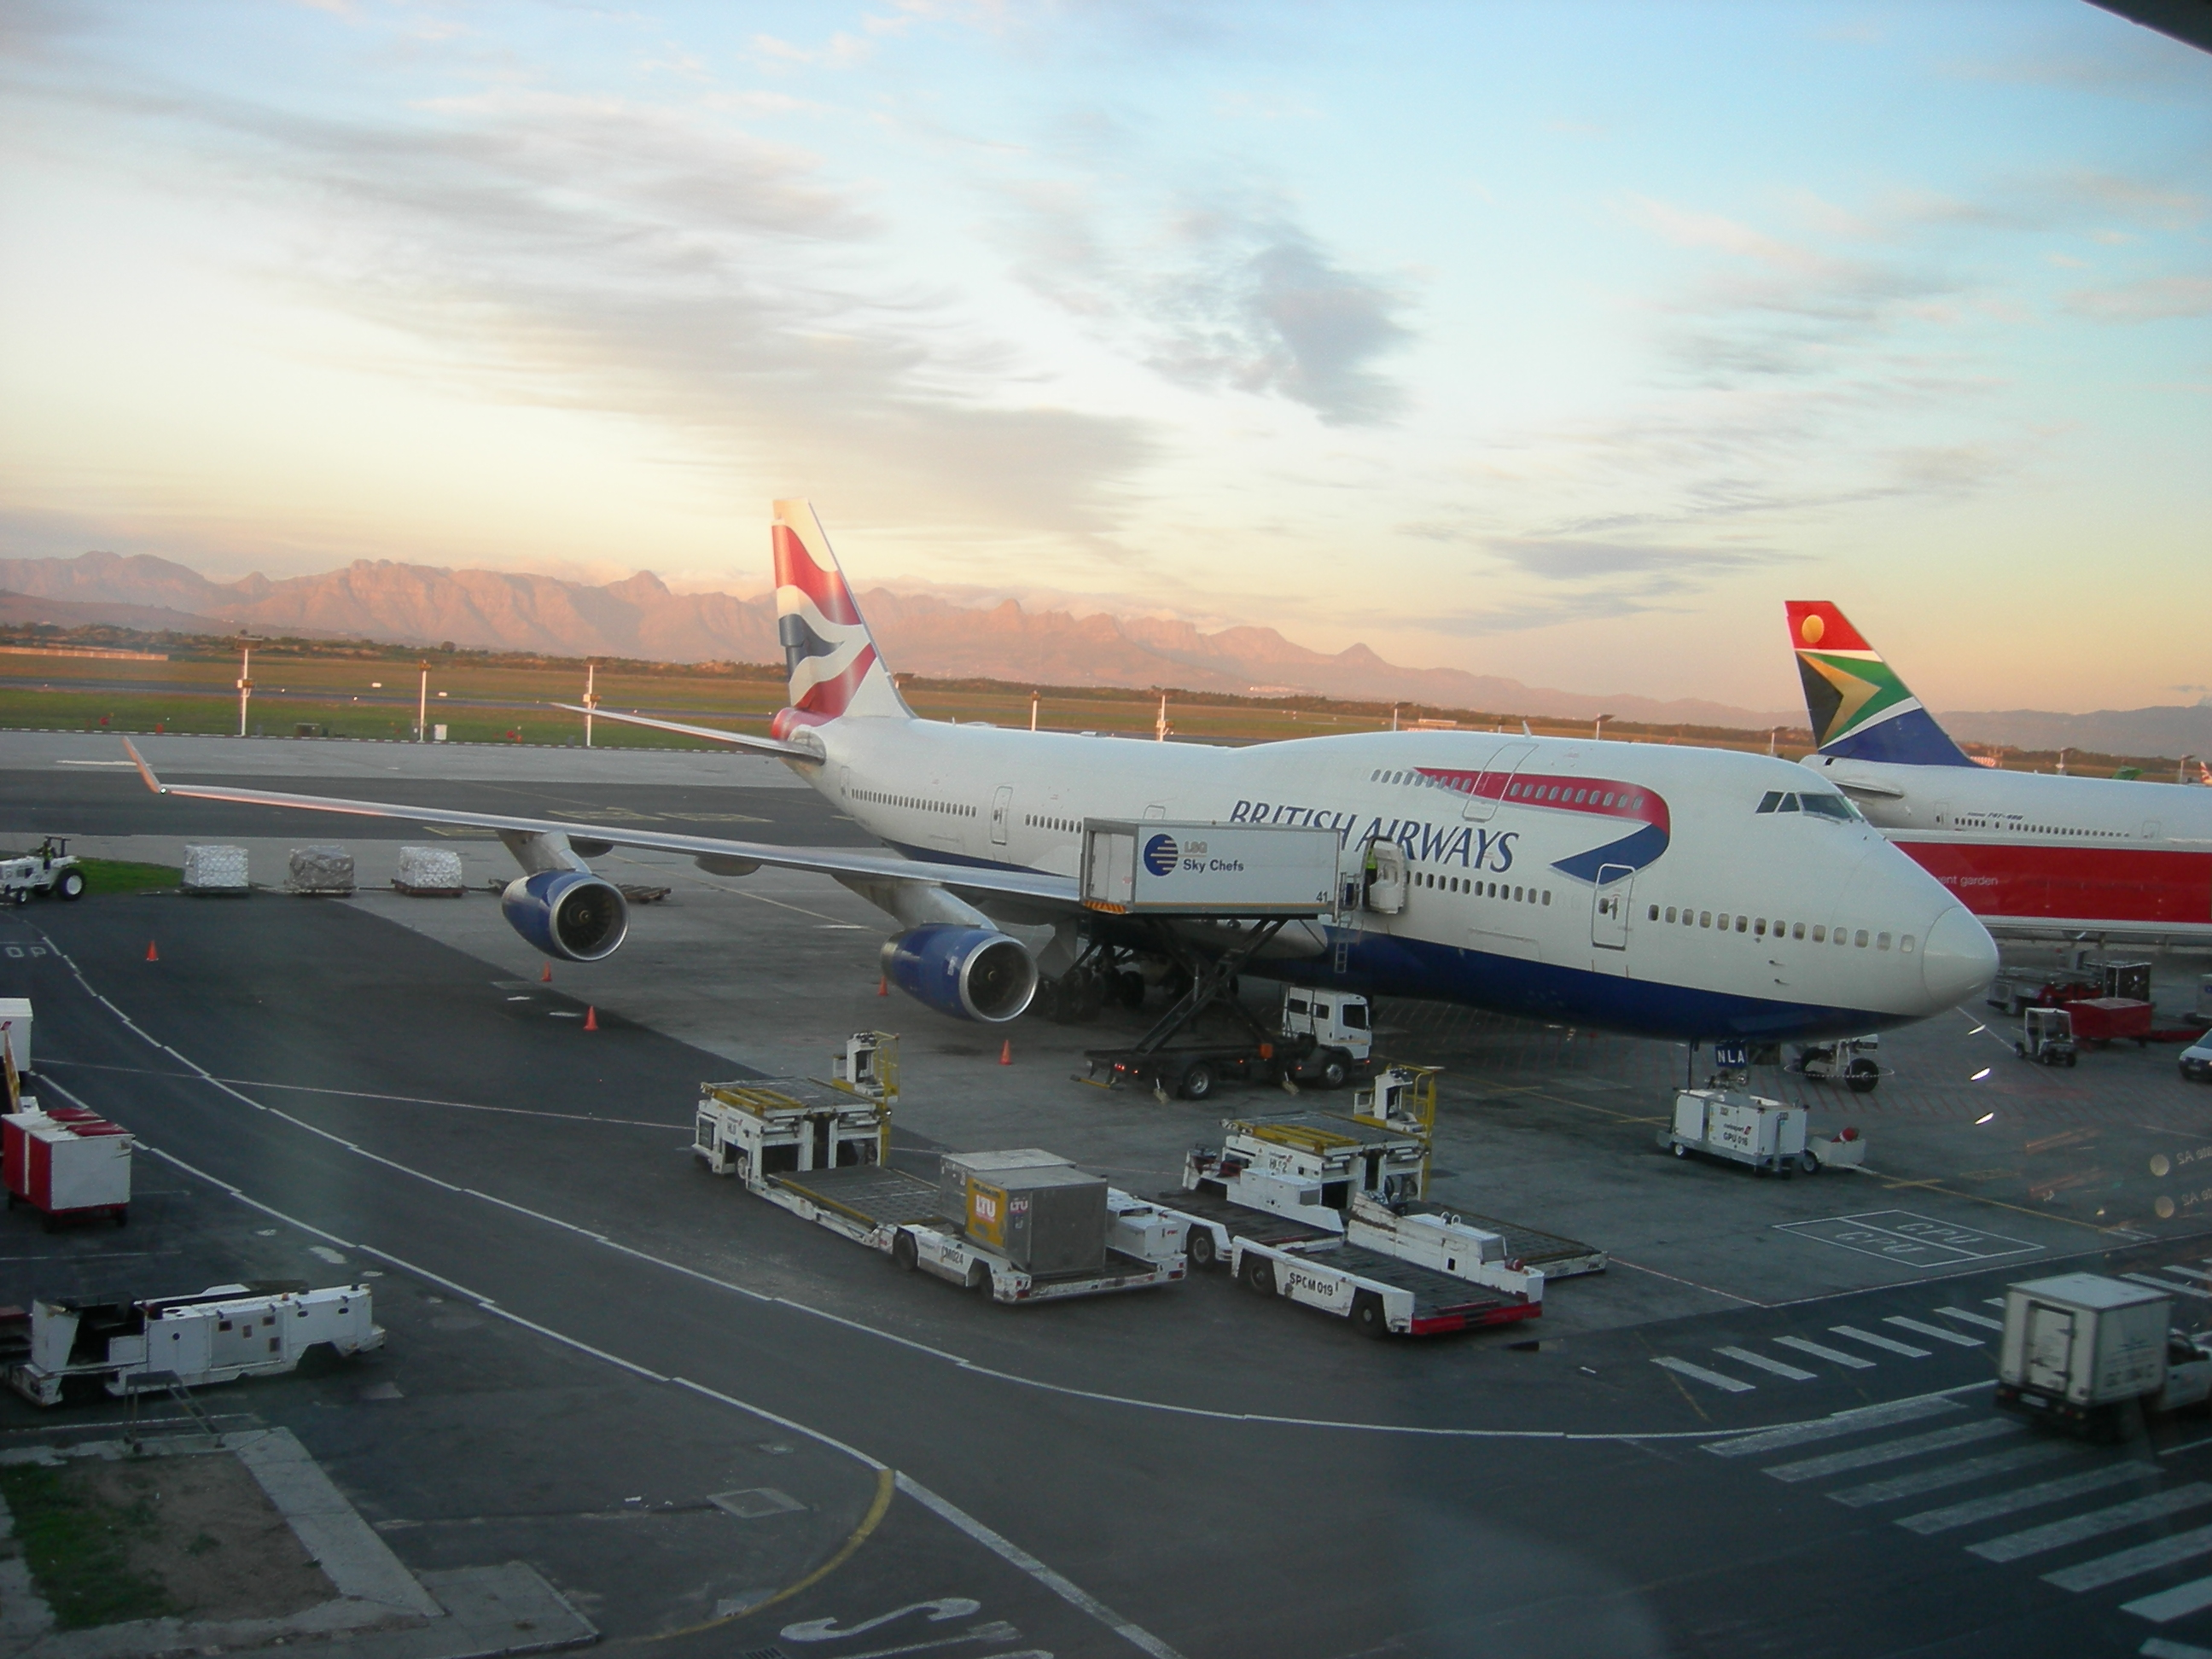 Abu dhabi airports company tenders dating 10